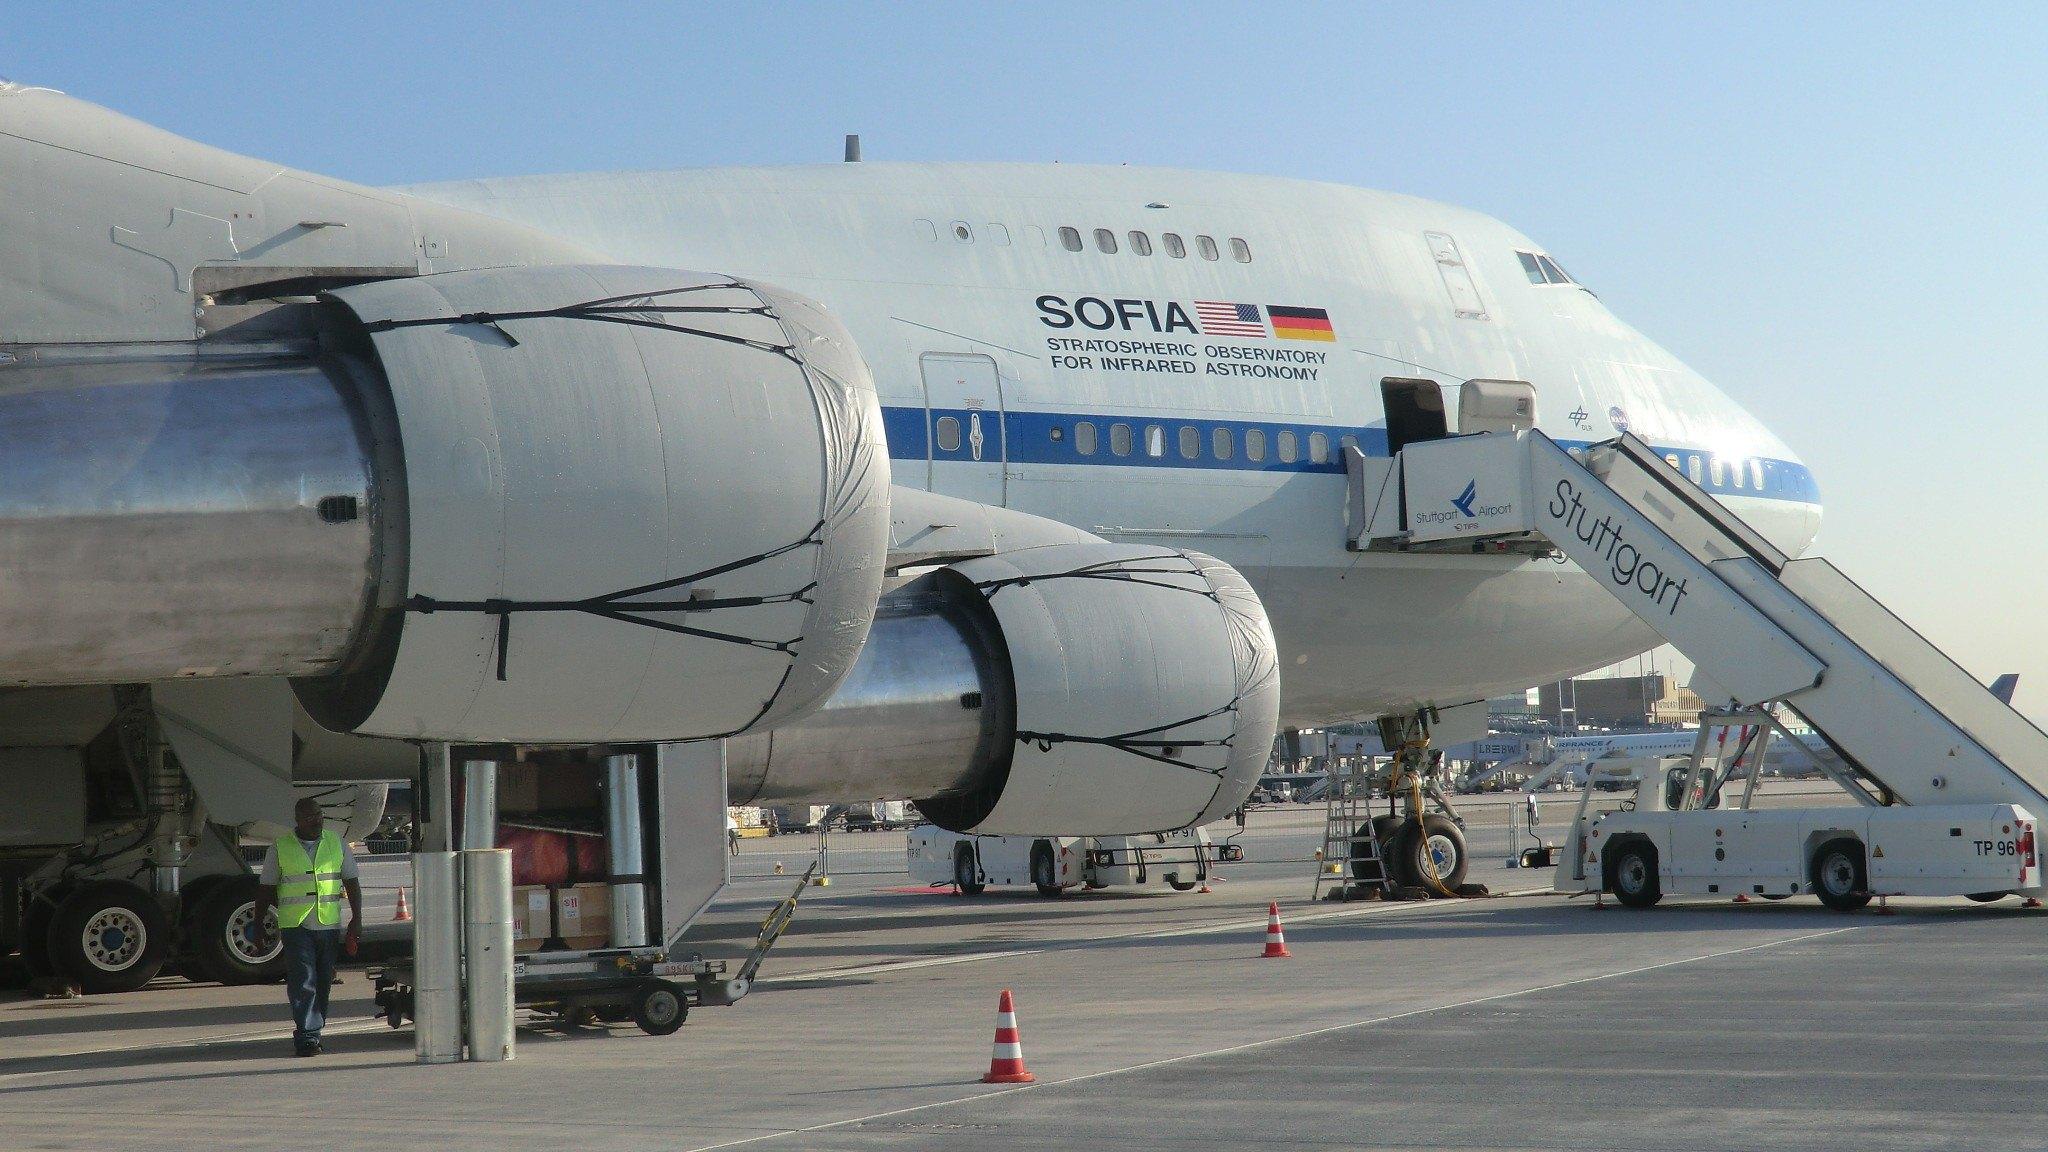 Stuttgart: SOFIA Astronomical Research Aircraft- powerful ...